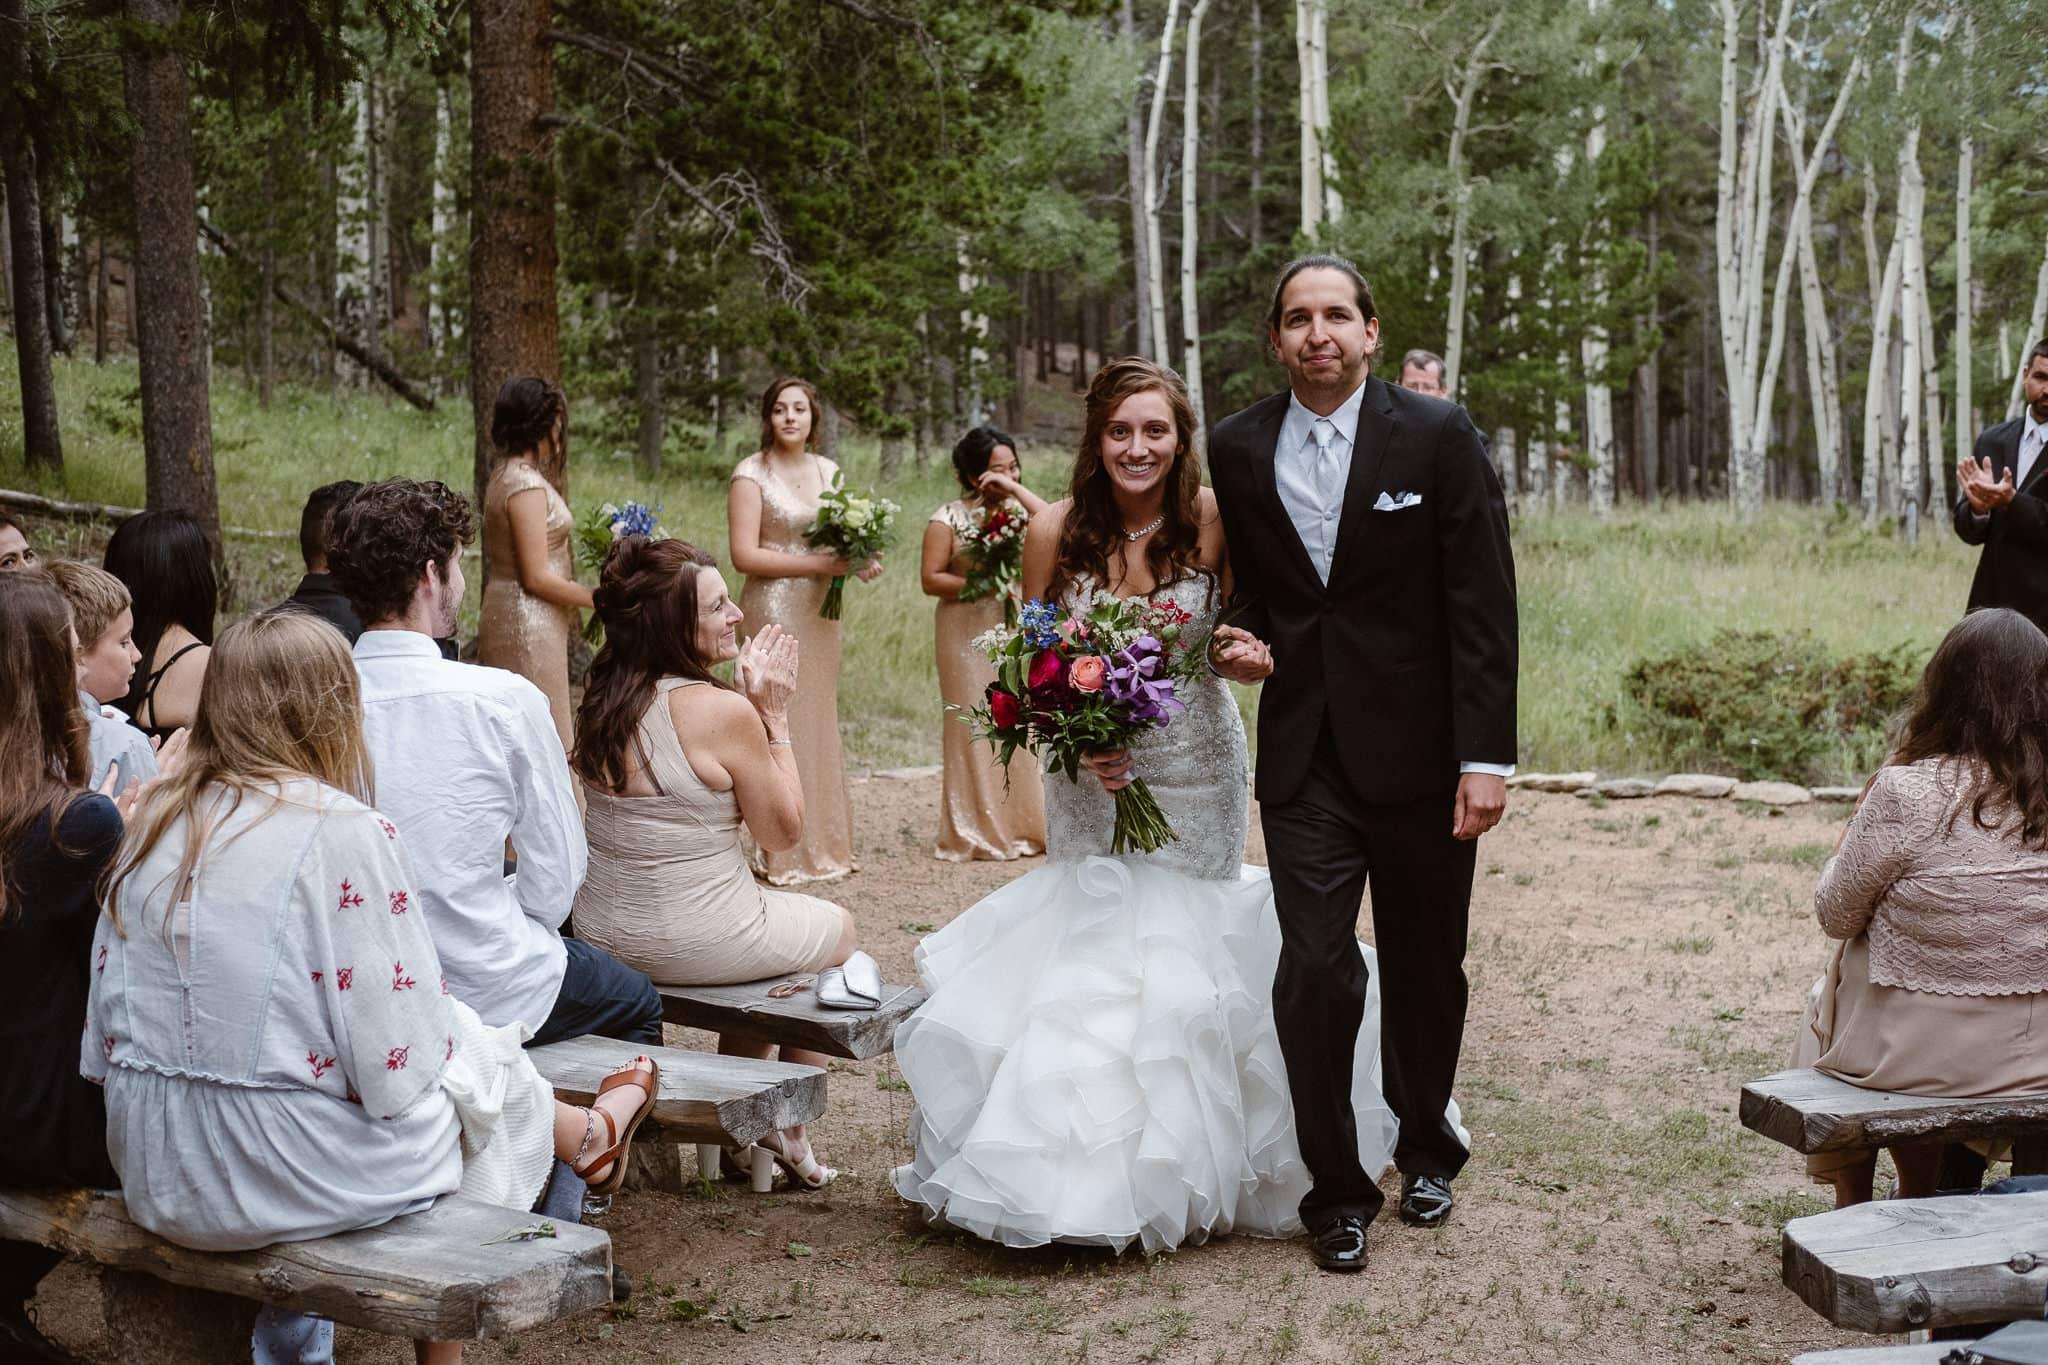 Dao House wedding photographer, Estes Park wedding venue, Colorado mountain wedding, outdoor ceremony, mountain ceremony, bride and groom walking down aisle, recessional